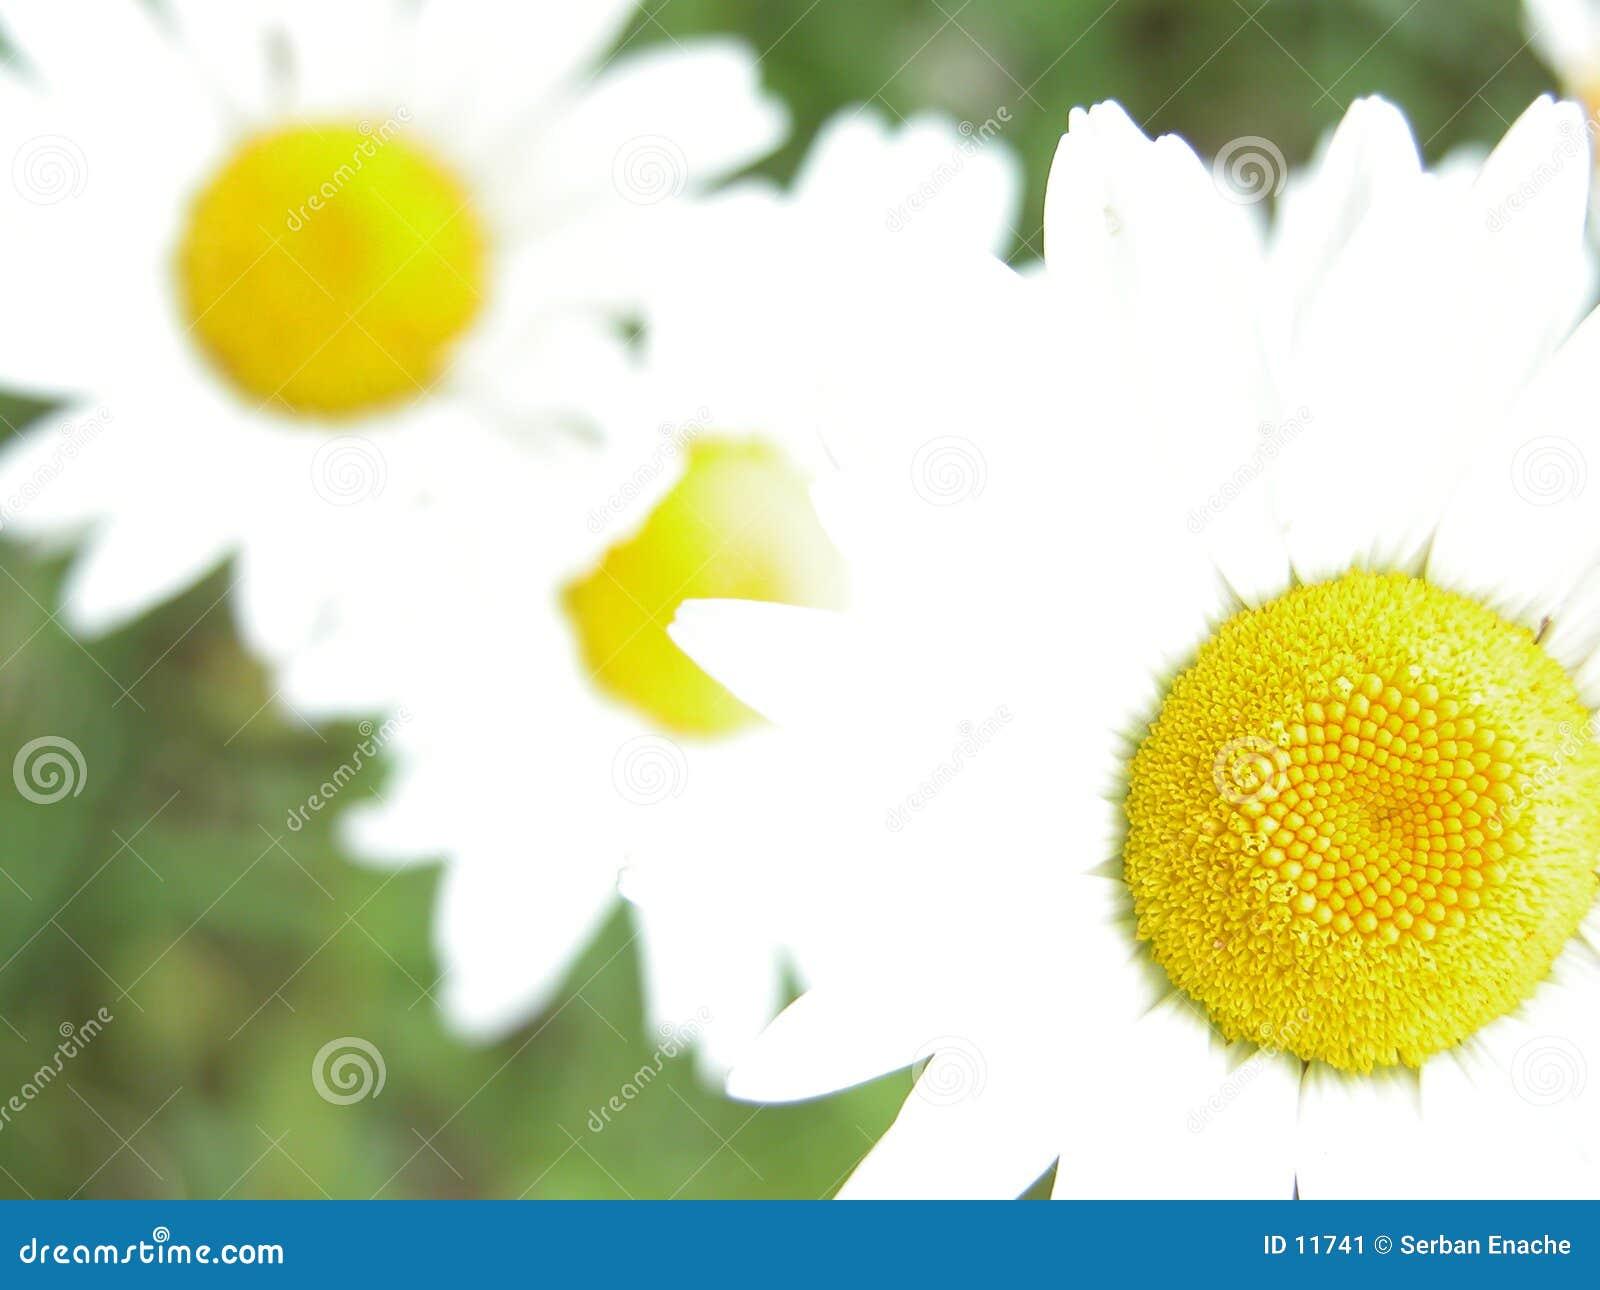 Overxposed daisies